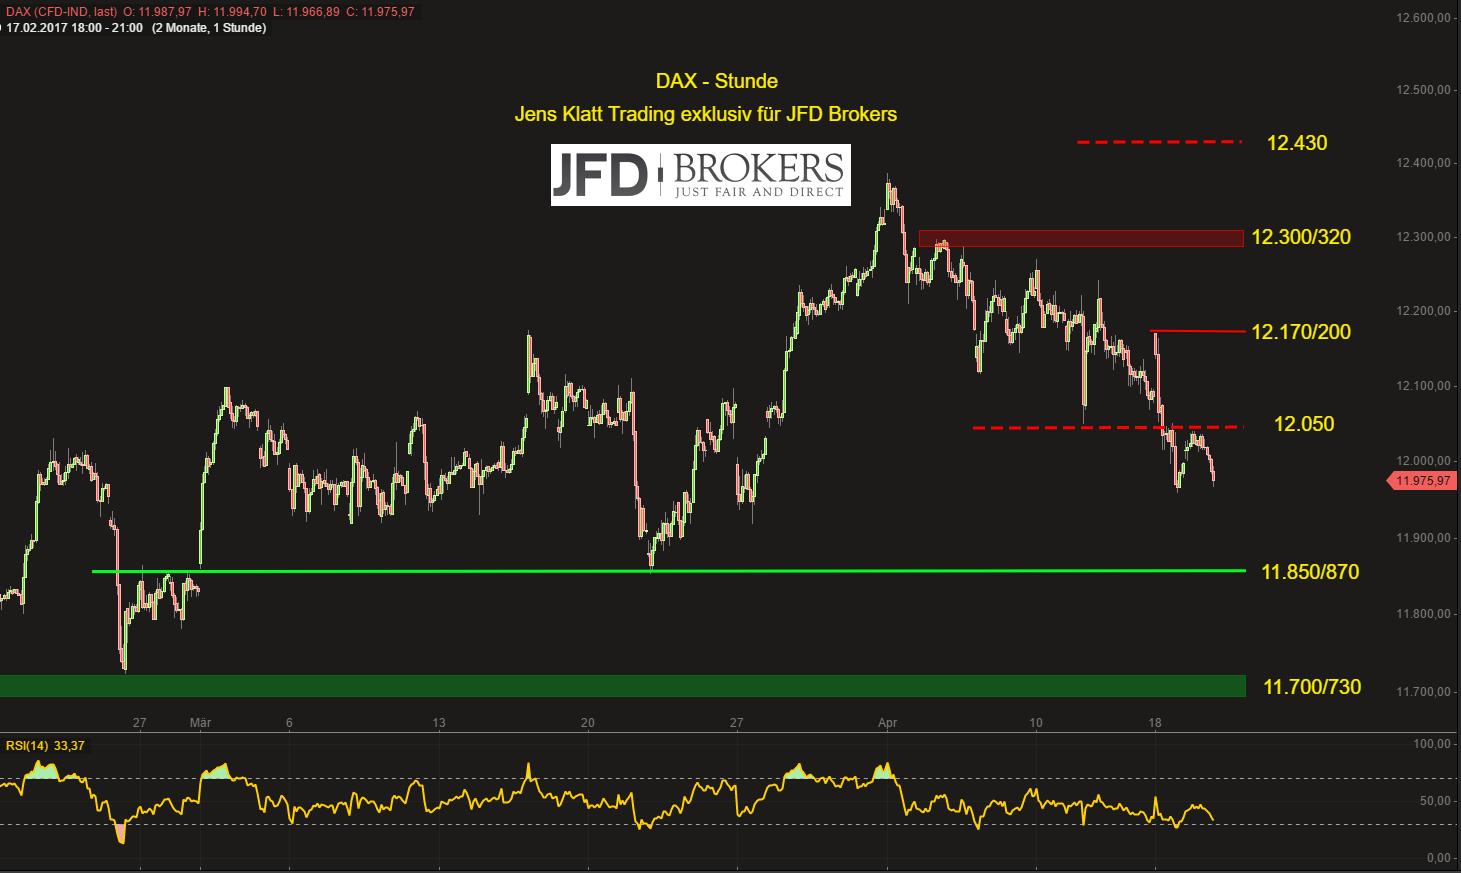 DAX-Gefahr-erneuten-Drops-in-Richtung-11-850-900-weiter-gegeben-JFD-Brokers-GodmodeTrader.de-2